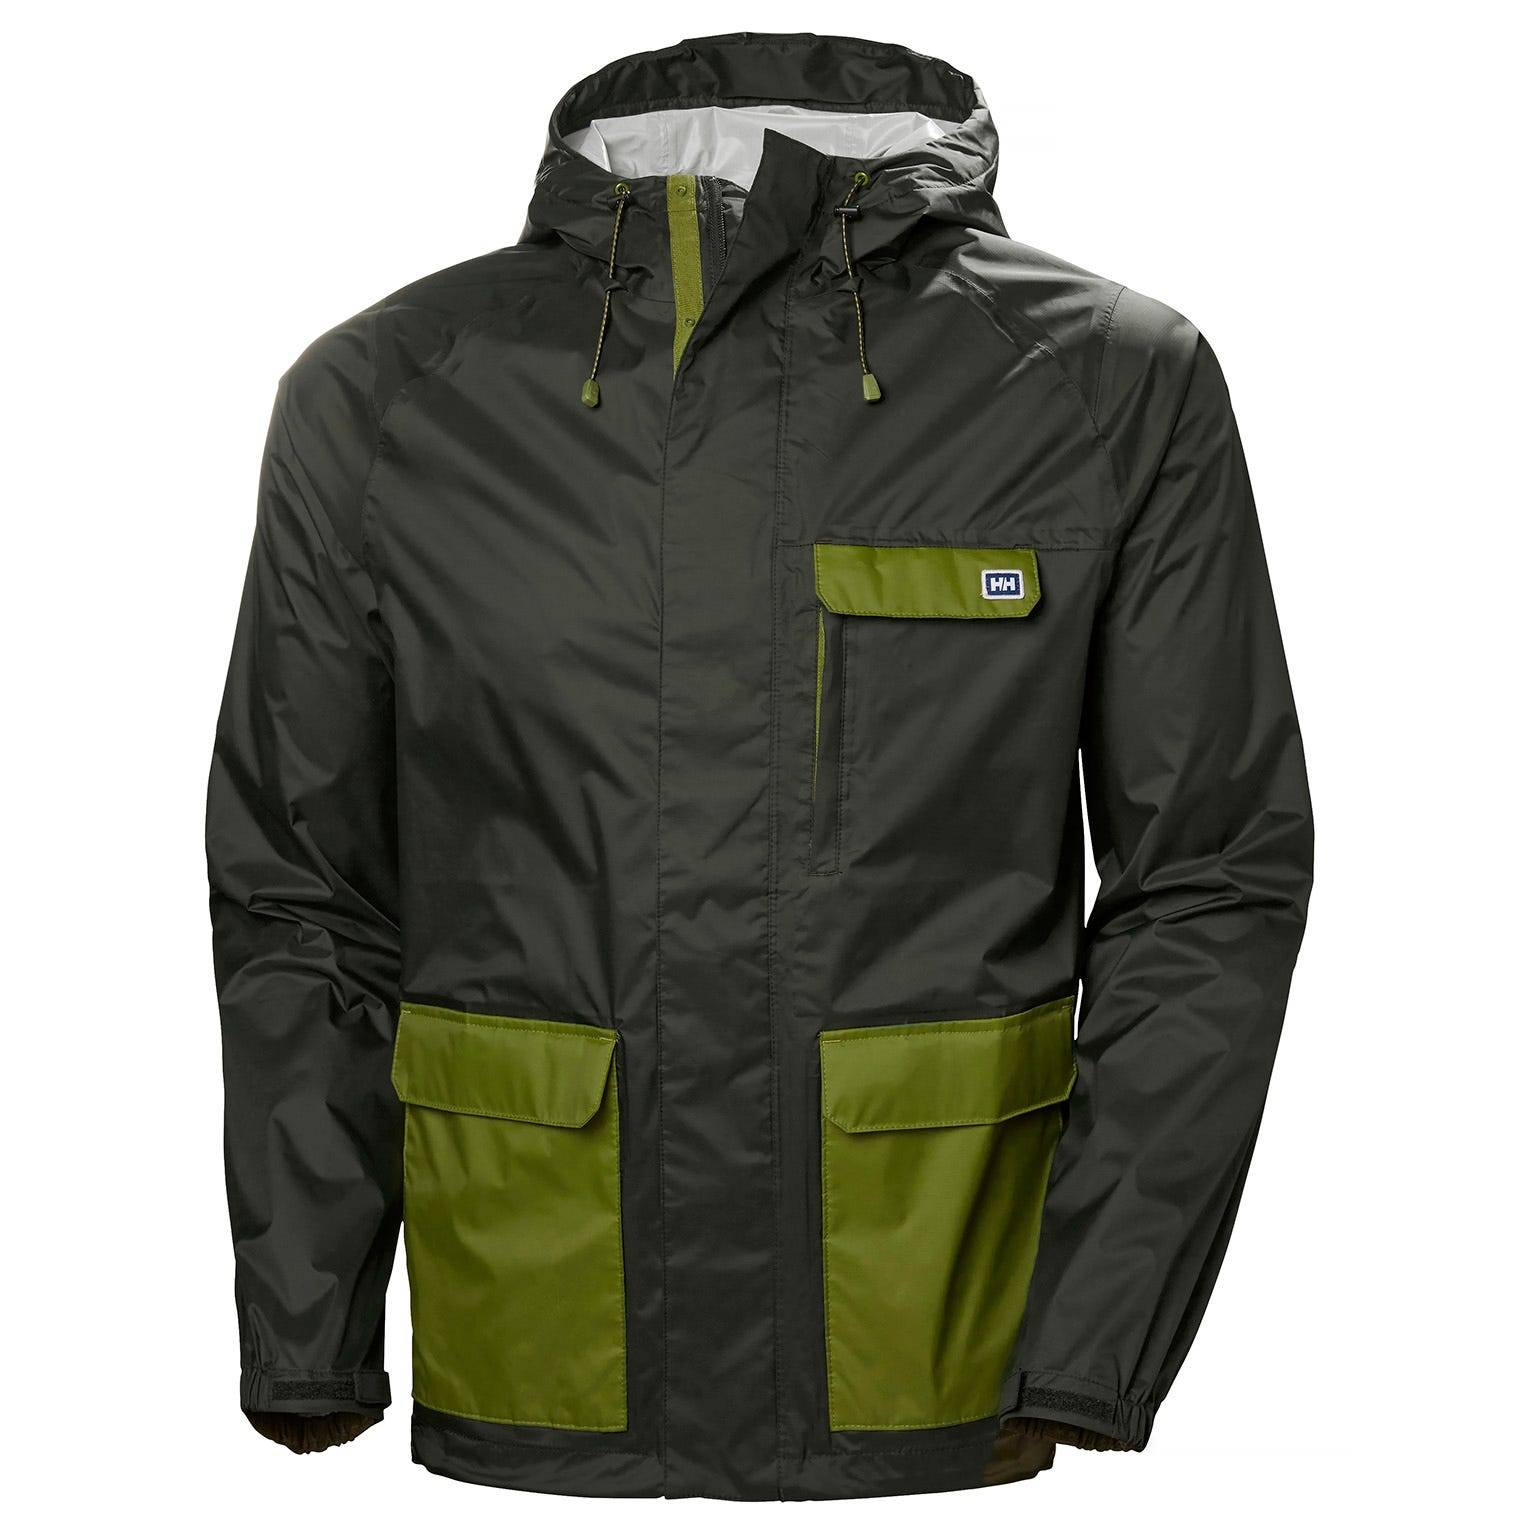 Helly Hansen Roam 2.5l Jacket Mens Hiking Green XXL